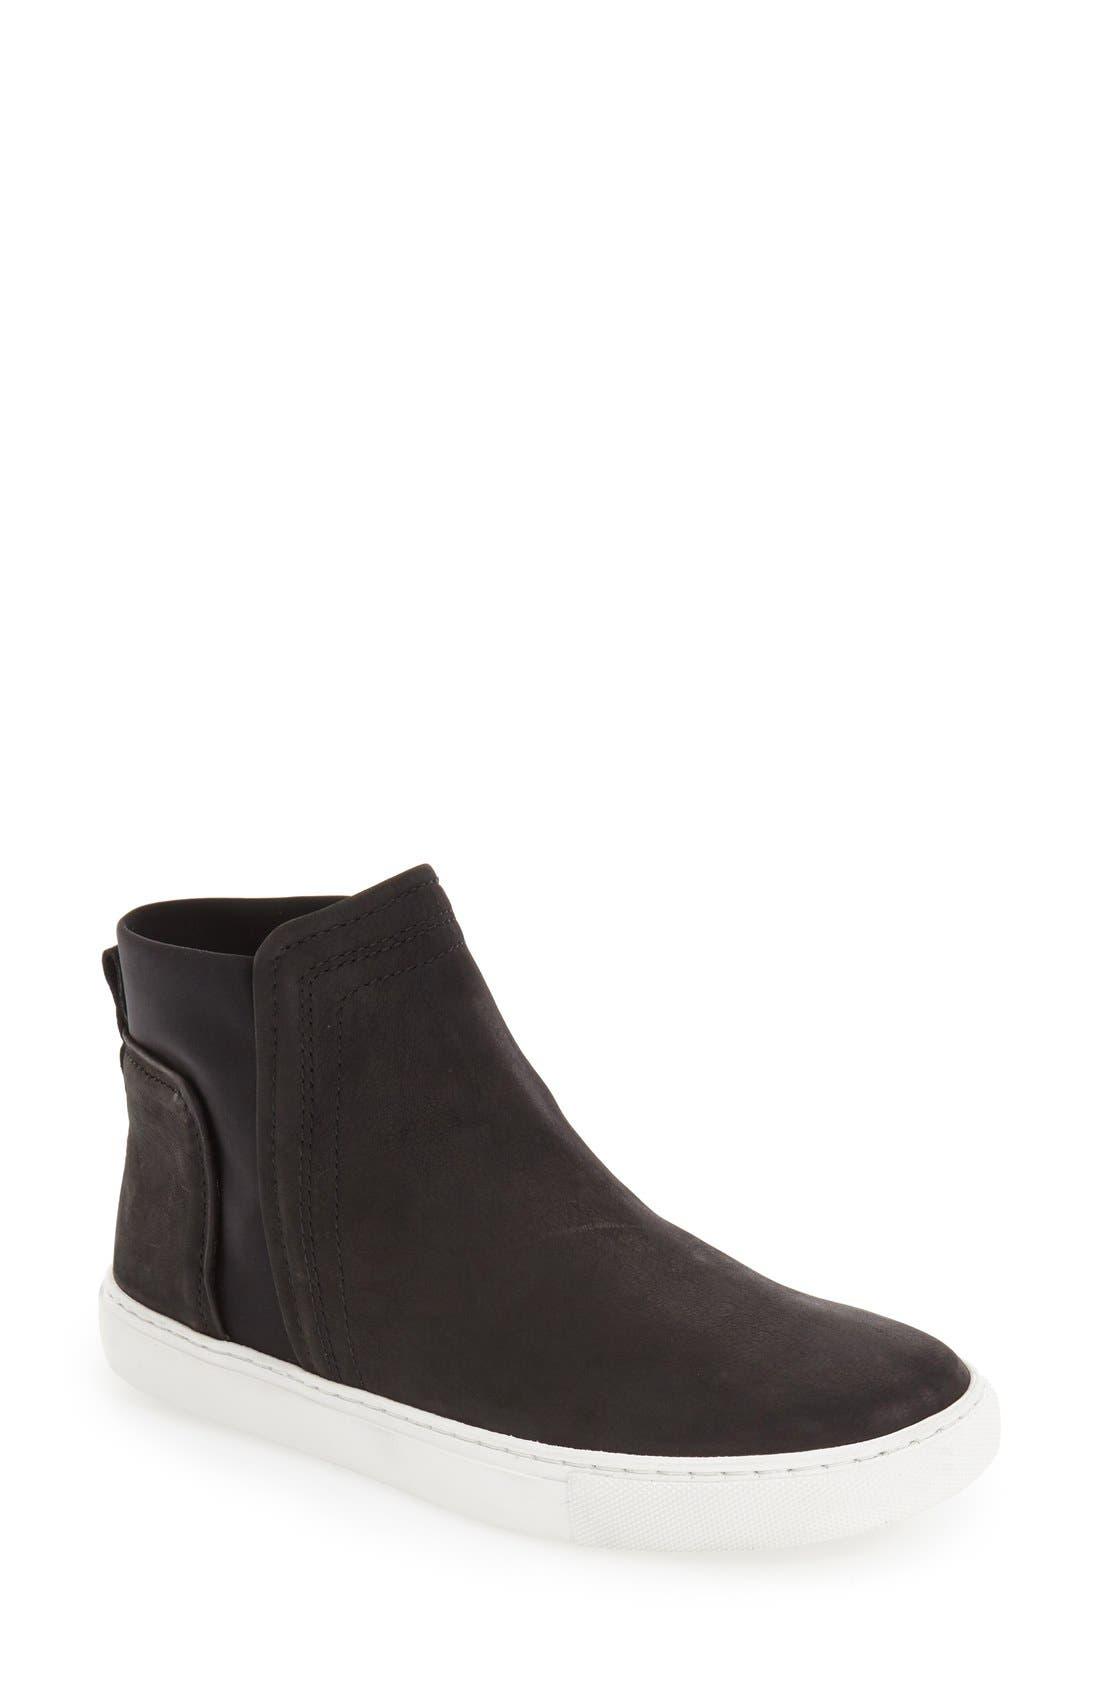 'Ken' Leather Slip-On Sneaker,                         Main,                         color, 001